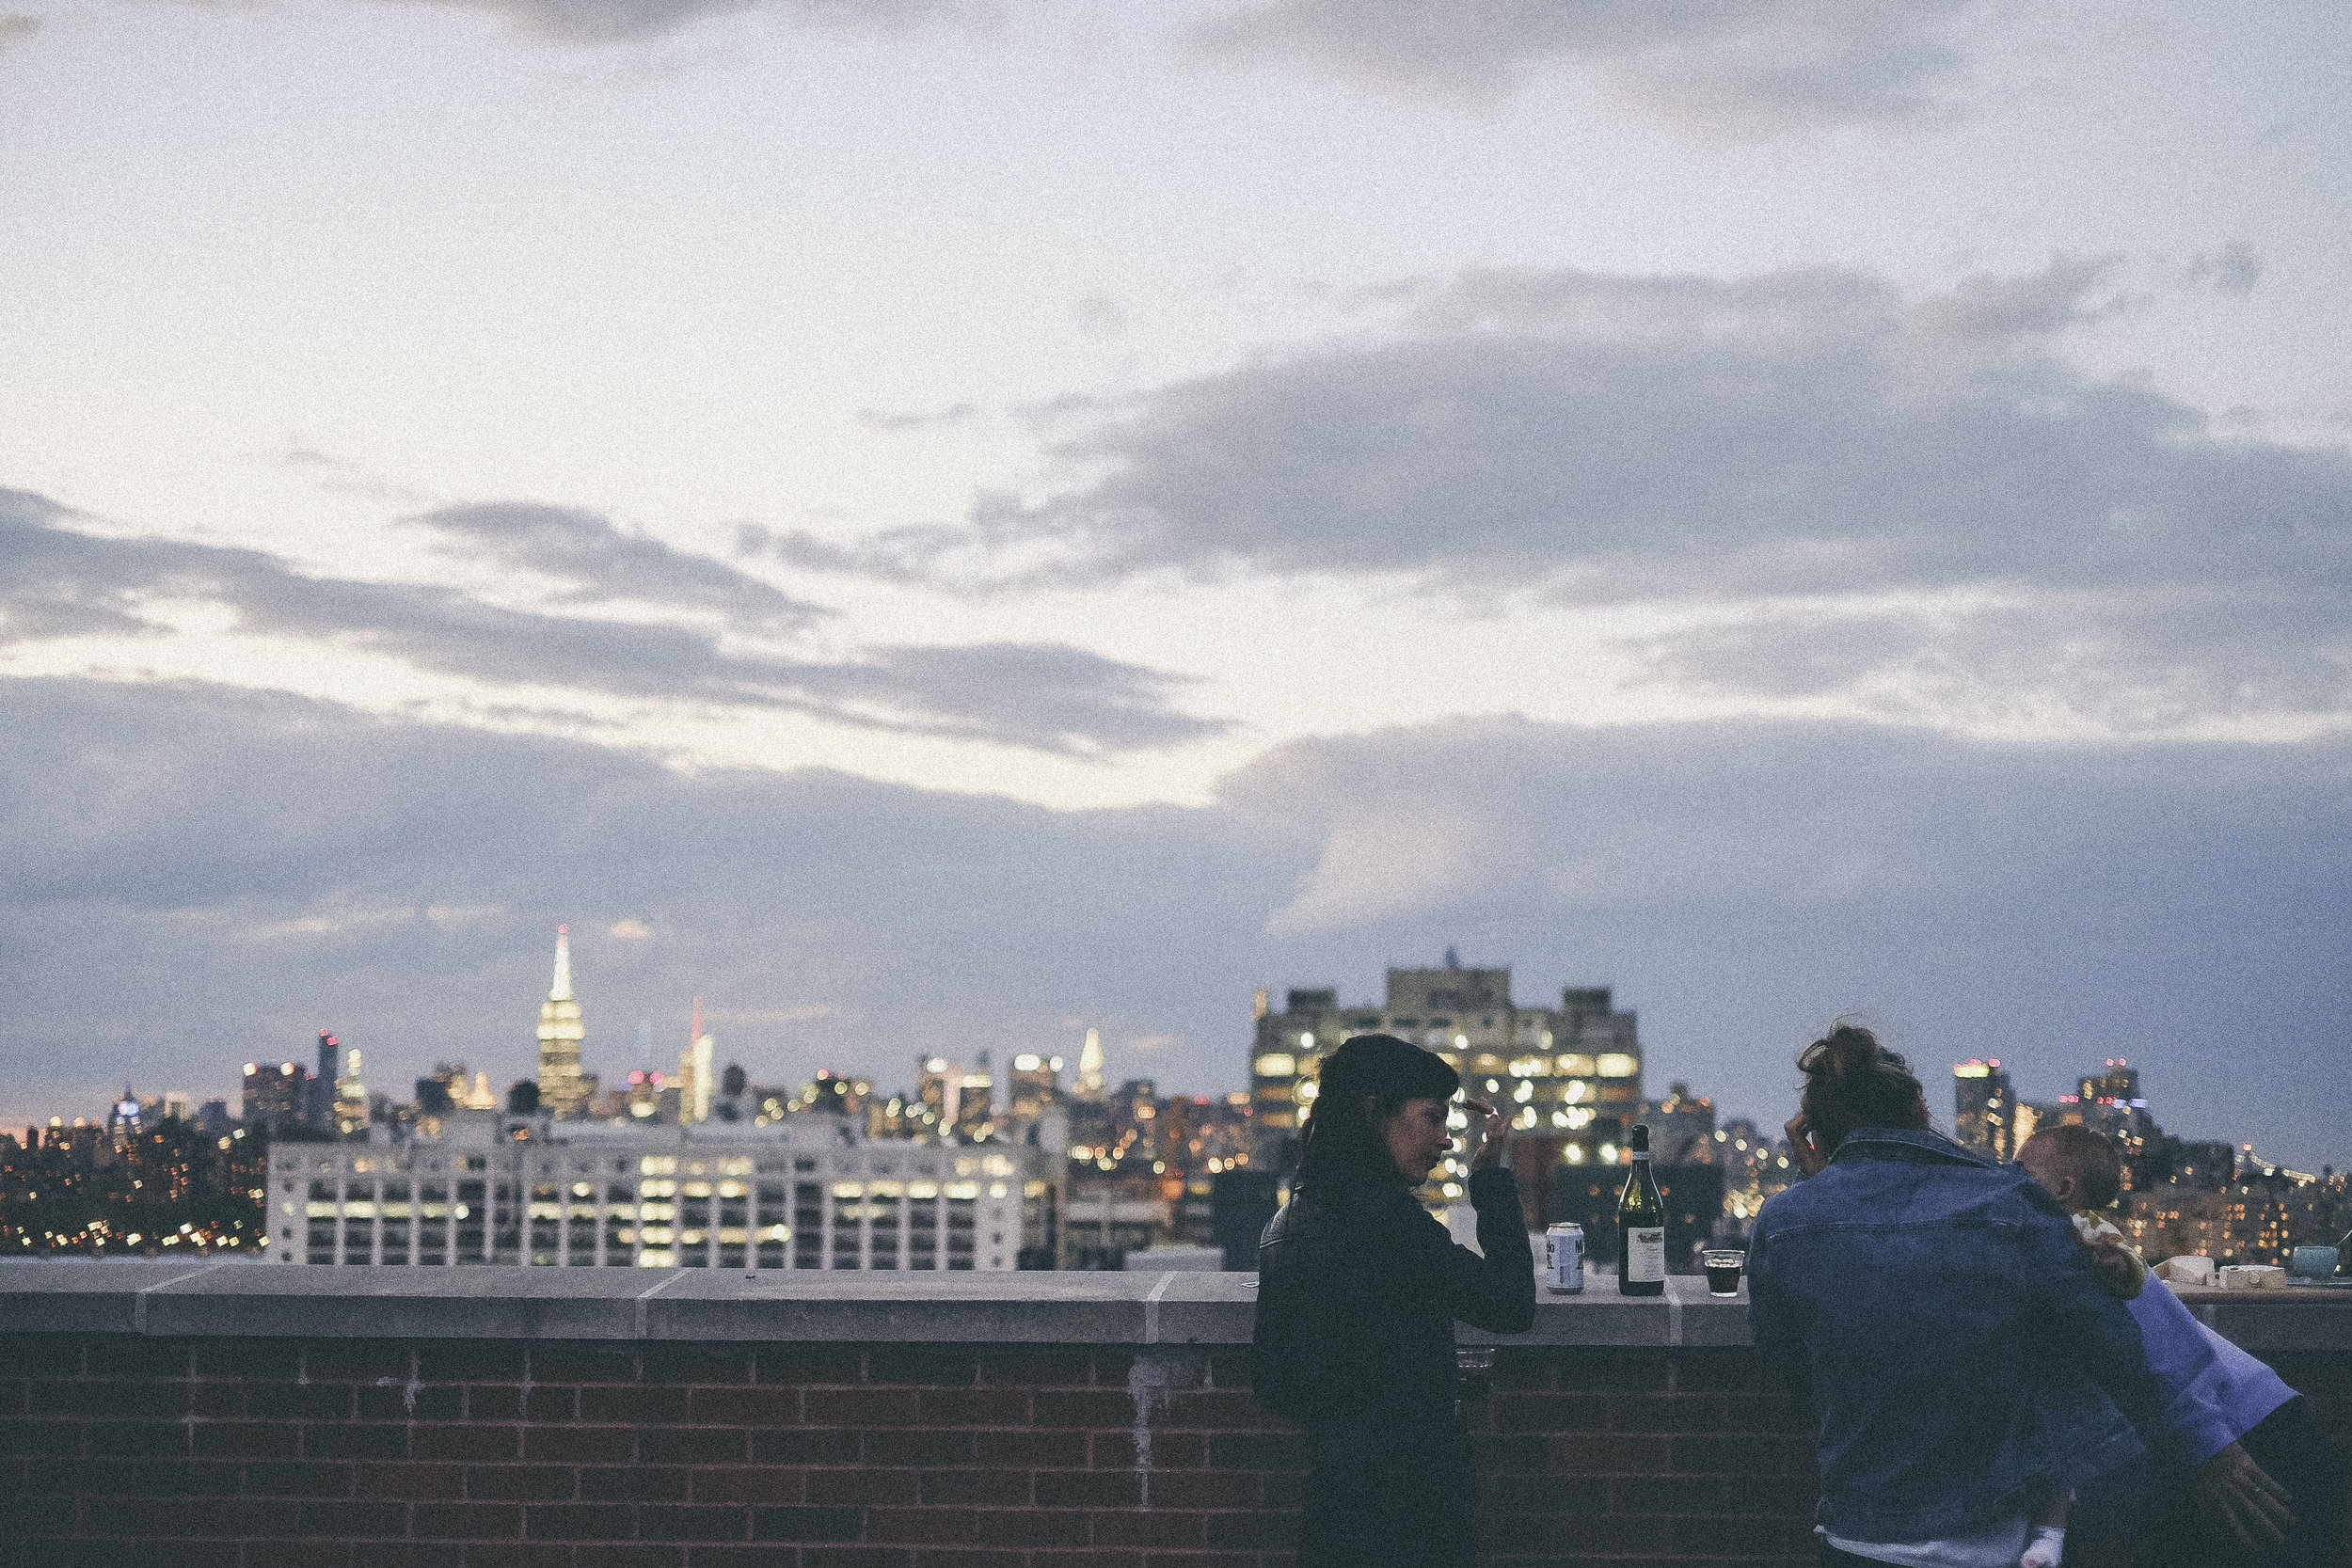 dérrive travel - BROOKLYN rooftop, new york #soho #dumbo #newyork #nyc #brooklyn